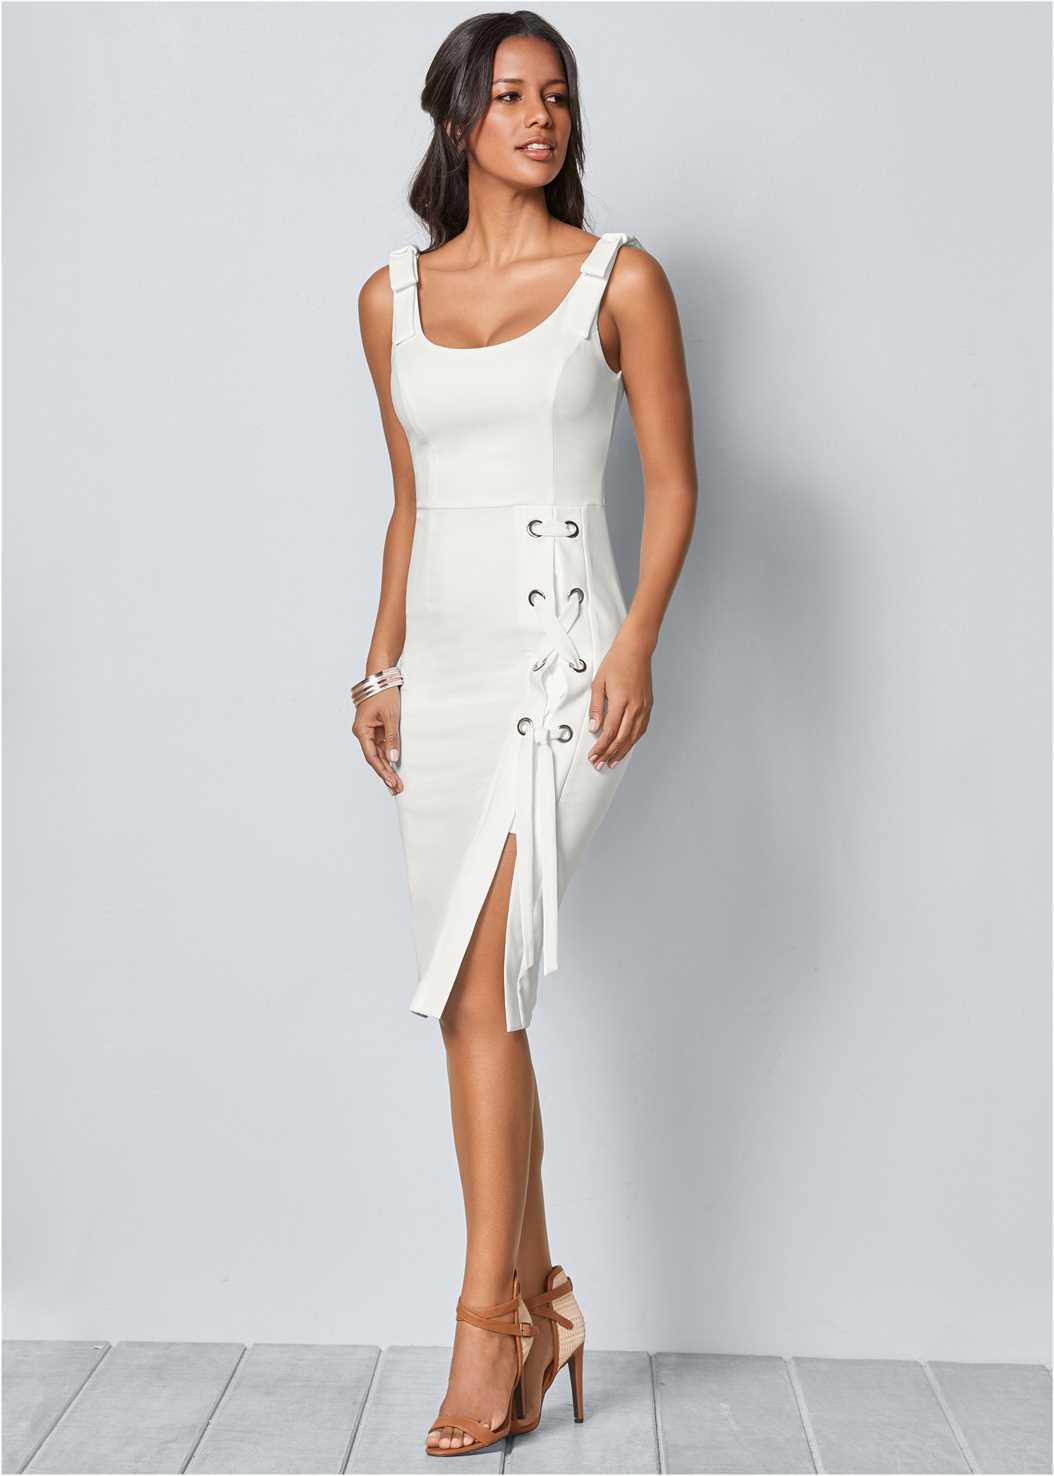 Lace Up Detail Sleeveless Dress